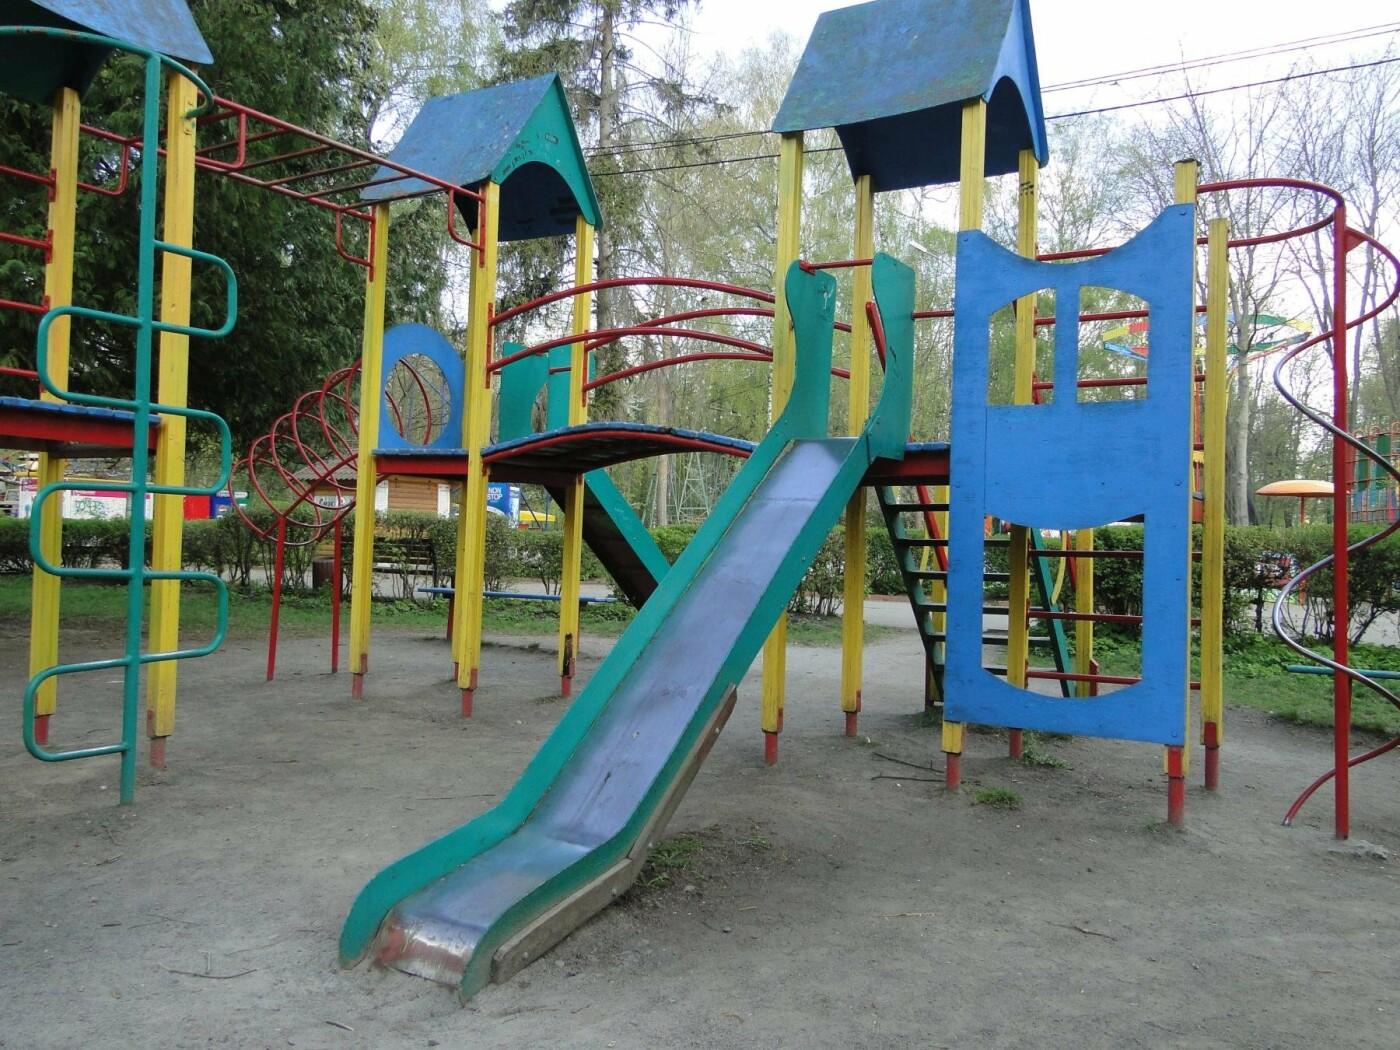 Травмоване дитинство: де зачаїлася небезпека на дитячому майданчику в парку Чекмана. ФОТО, фото-2